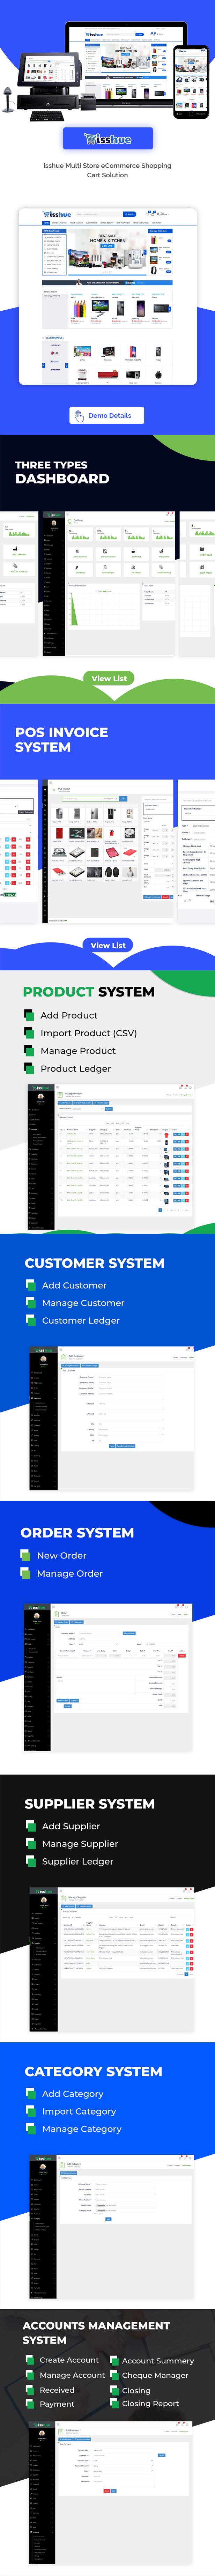 Isshue - Multi Store eCommerce Shopping Cart Solution - 3